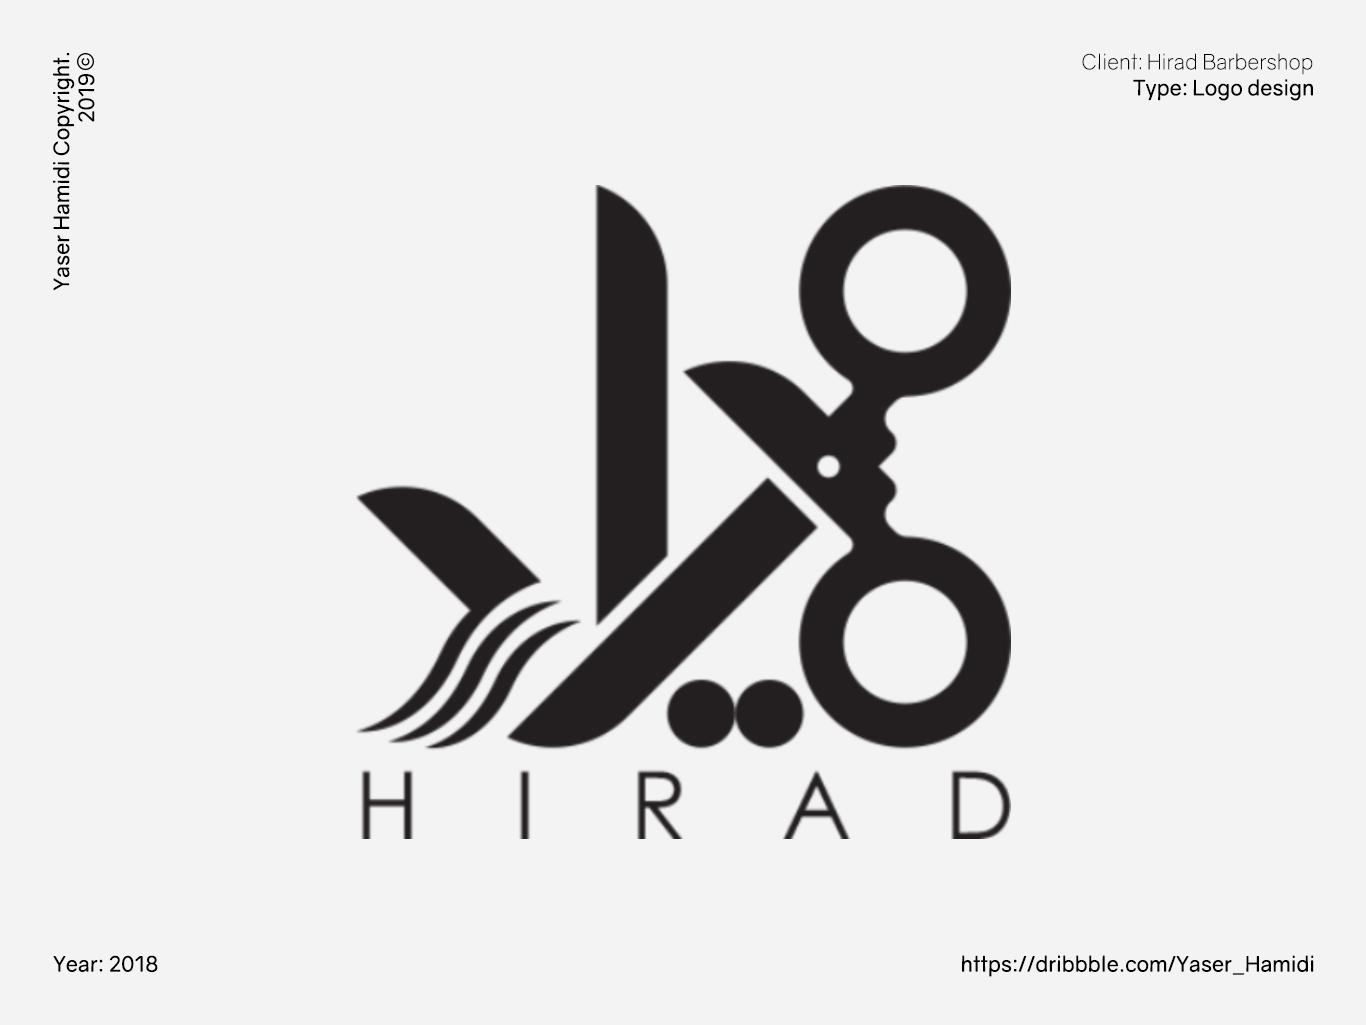 Hirad Barbershop   پیرایش هیراد vector typography design branding symbol logotype logotipo logoinspiration logodesign logo illustrator icon illustration brand design